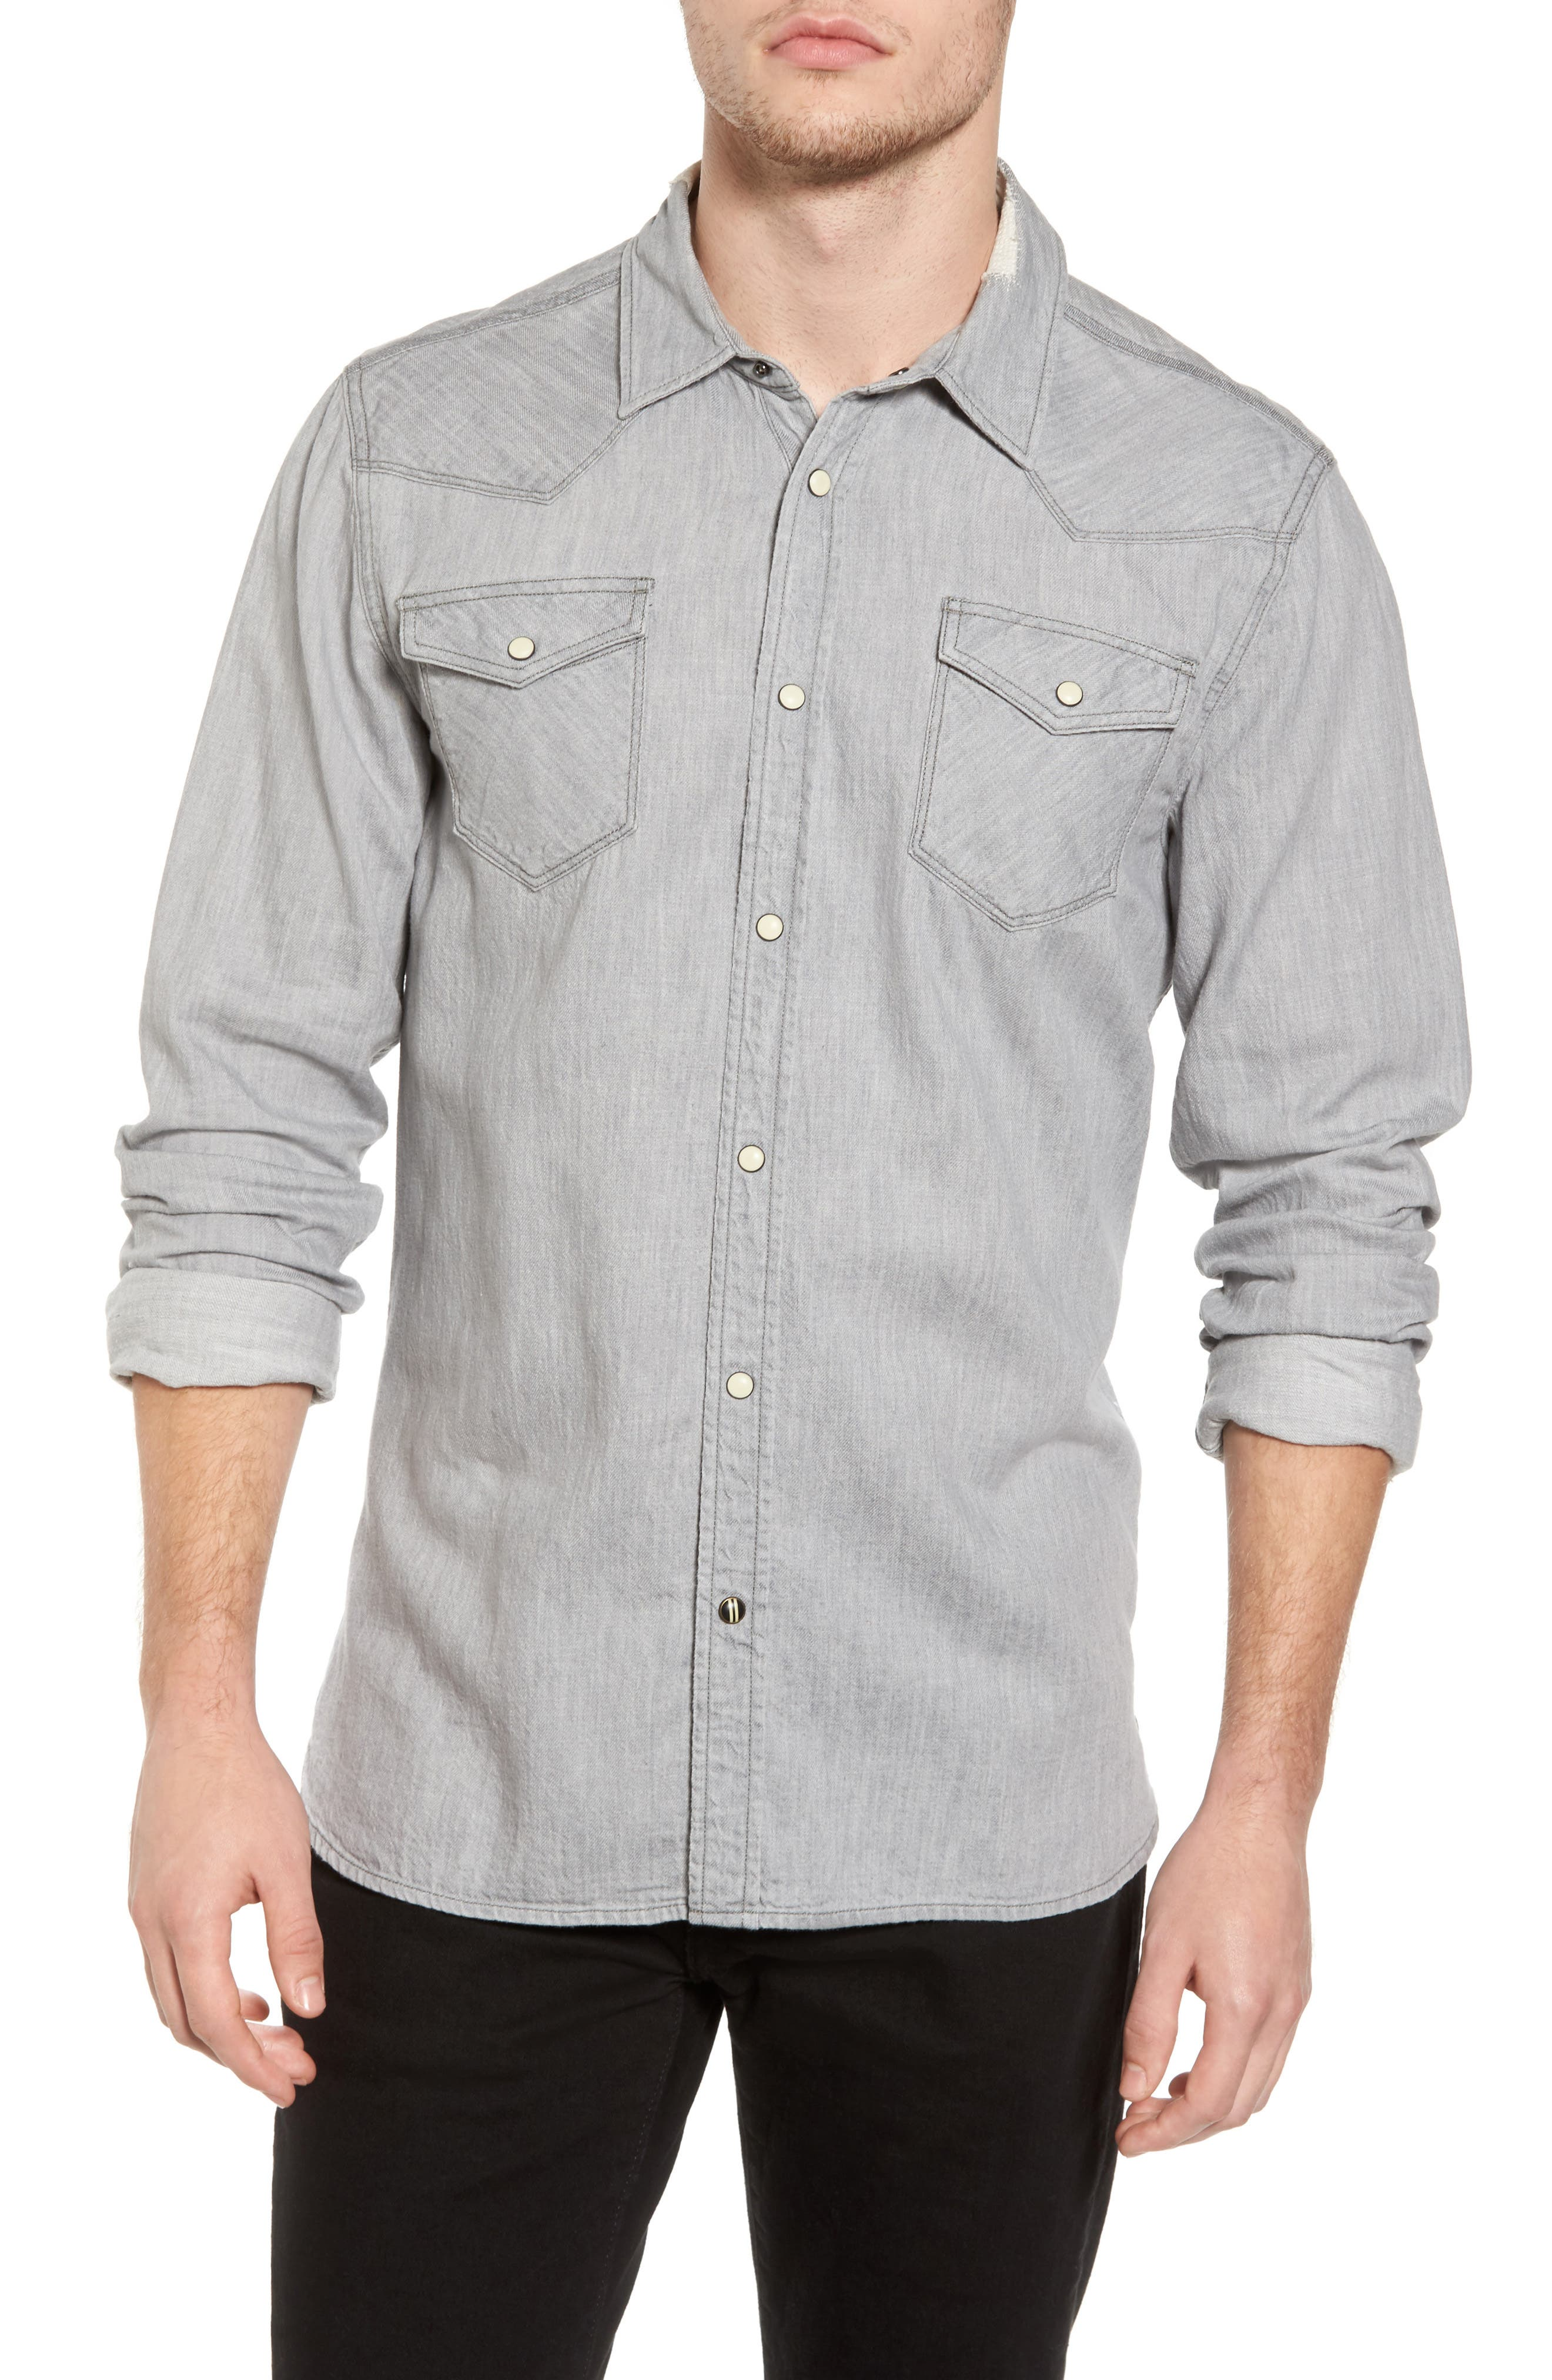 Main Image - Scotch & Soda Classic Western Shirt